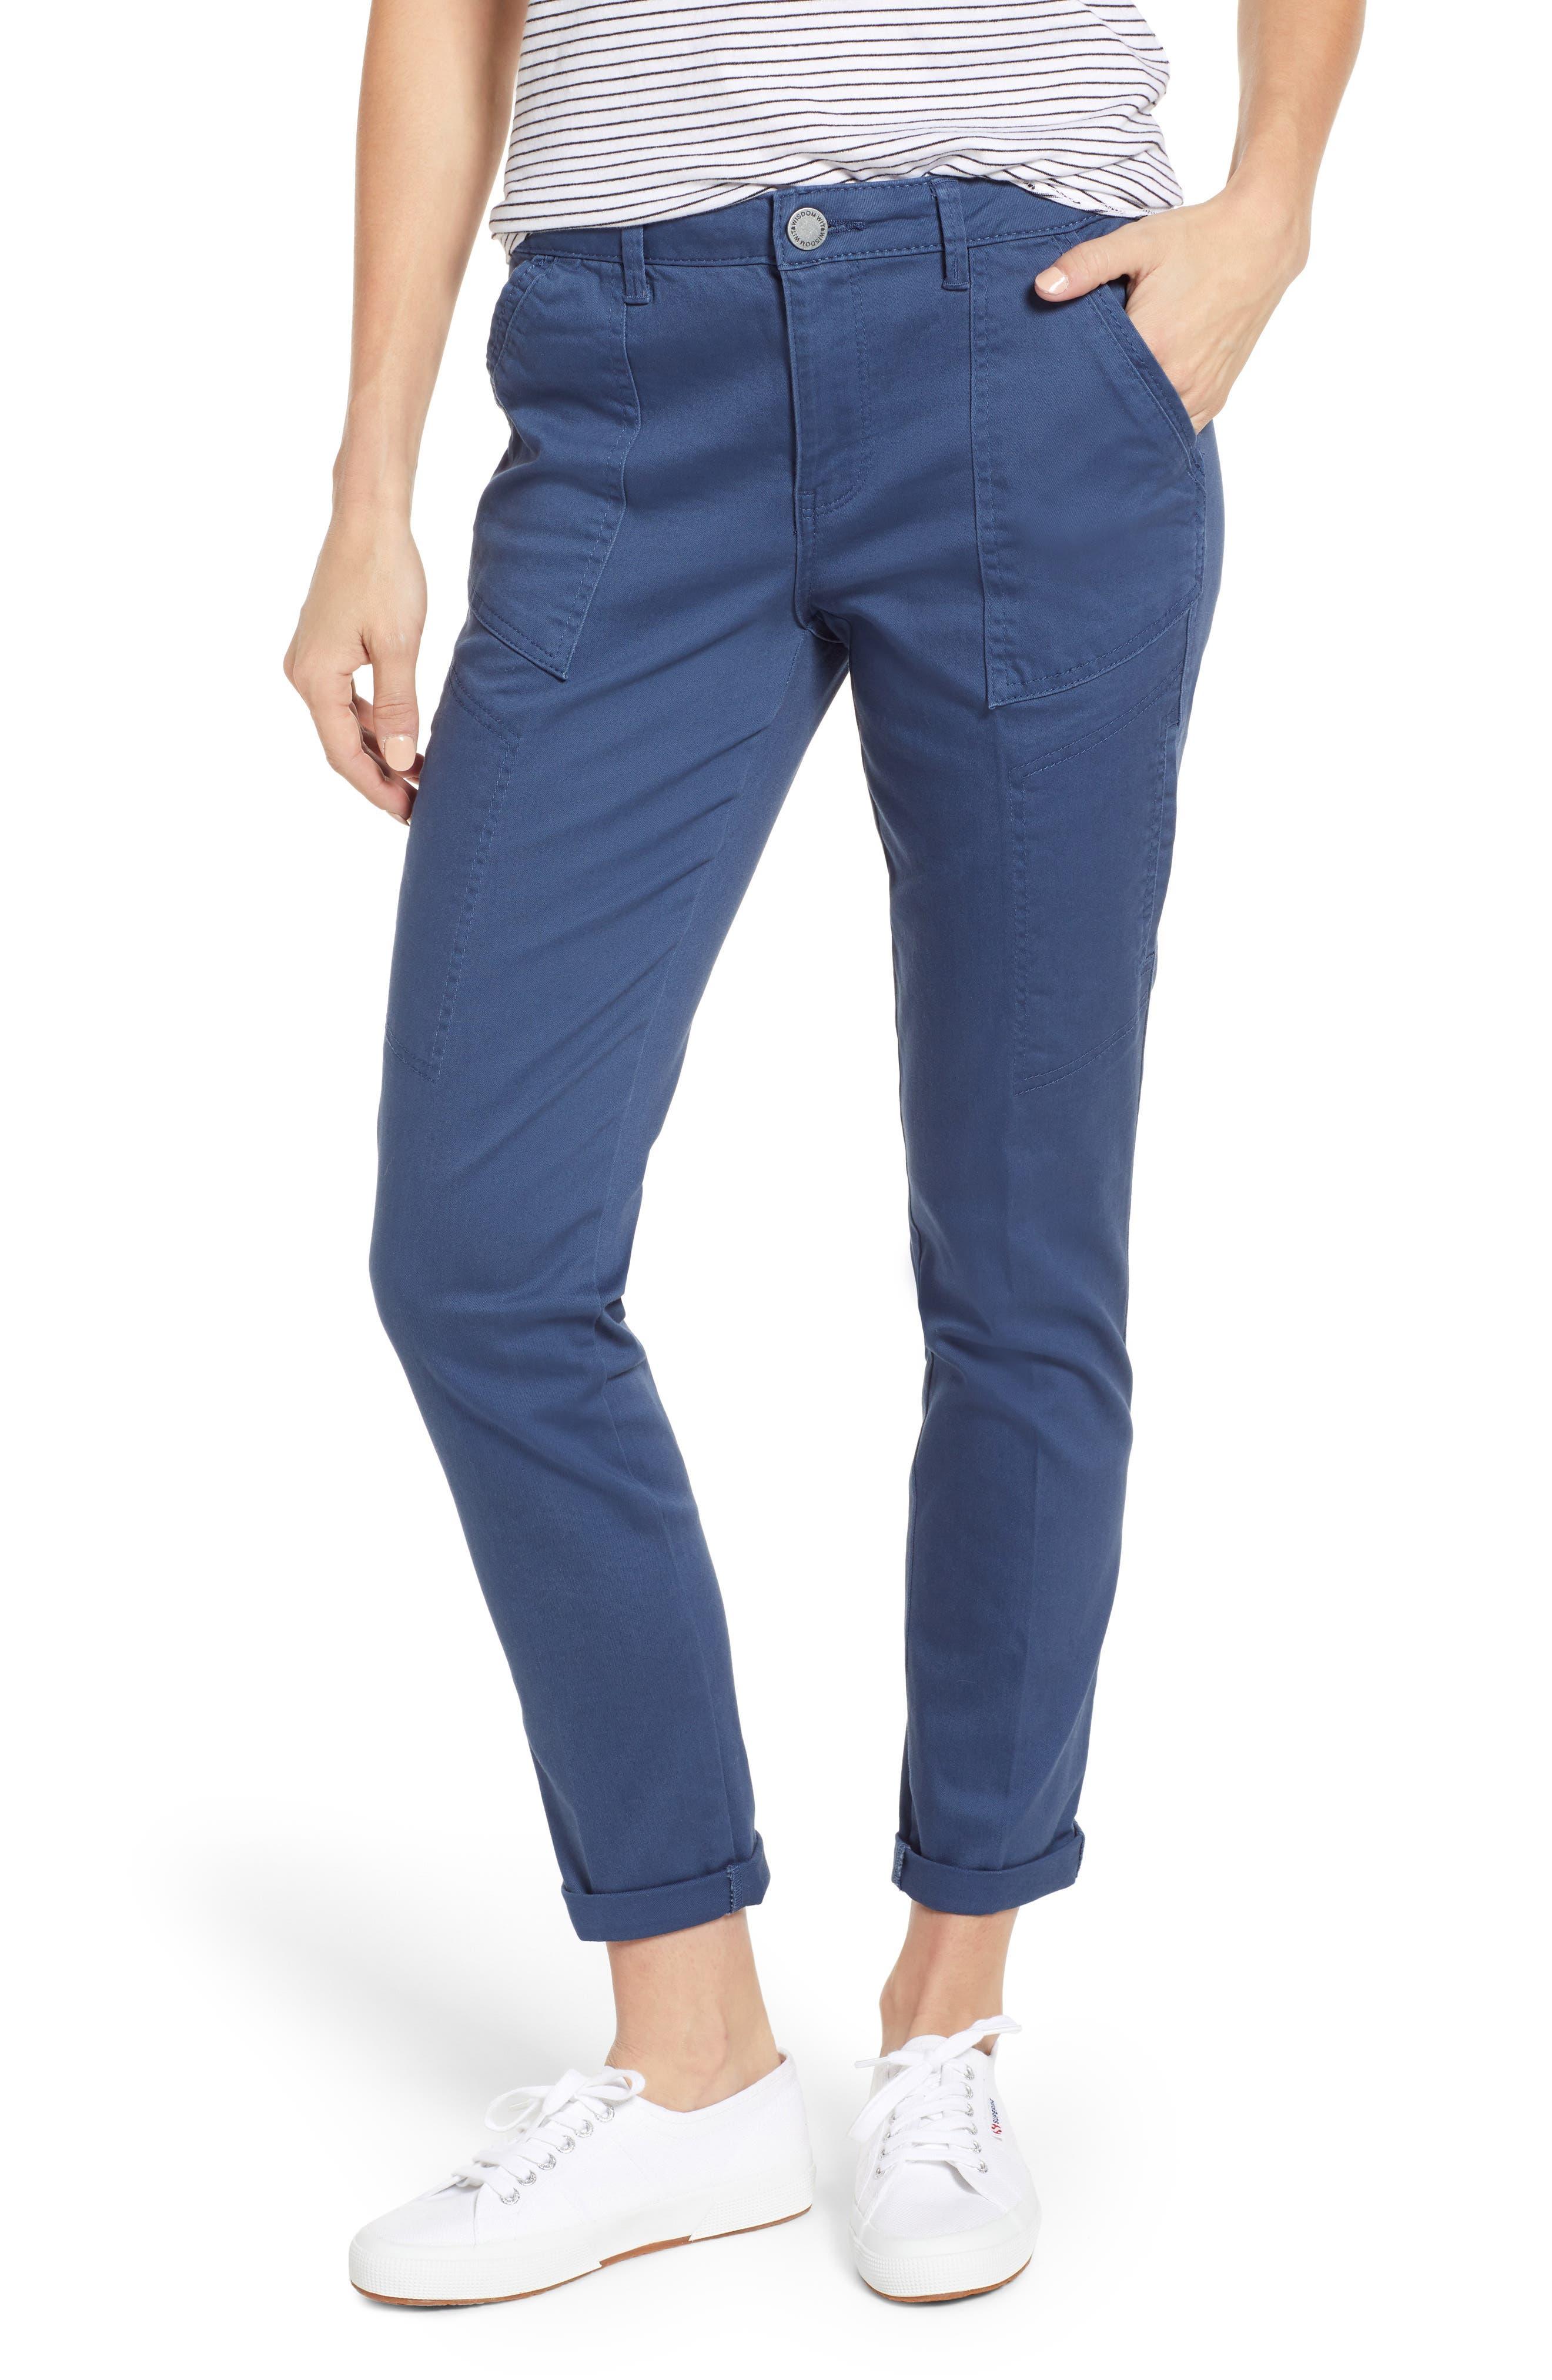 Wit & Wisdom Flex-Ellent High Waist Cargo Pants, Blue (Nordstrom Exclusive)